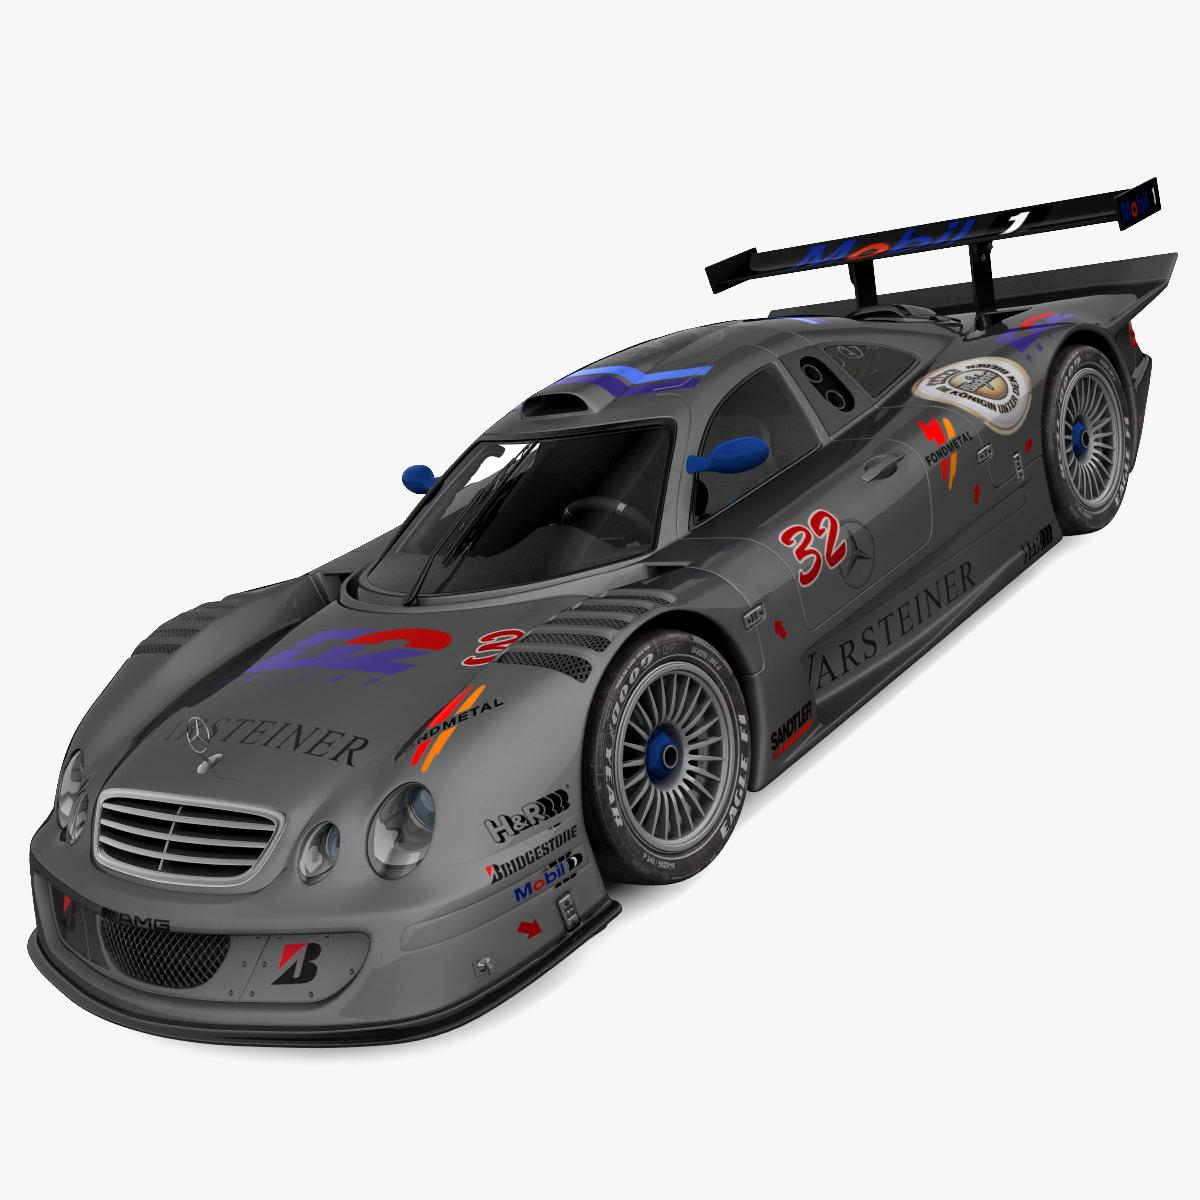 Mercedes_CLK_GTR_00.jpg